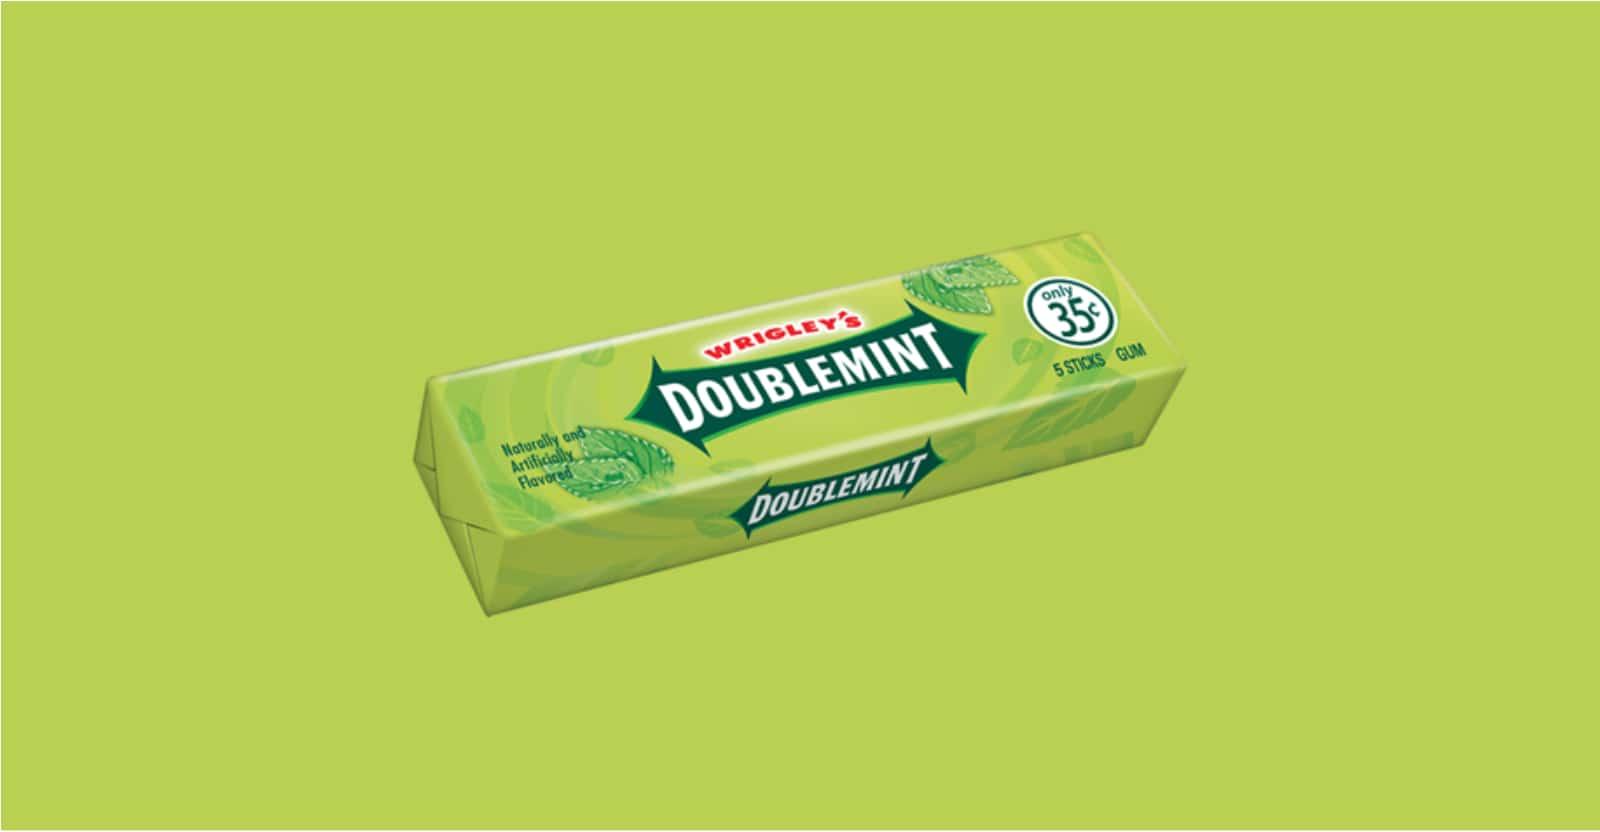 is doublemint gum gluten-free